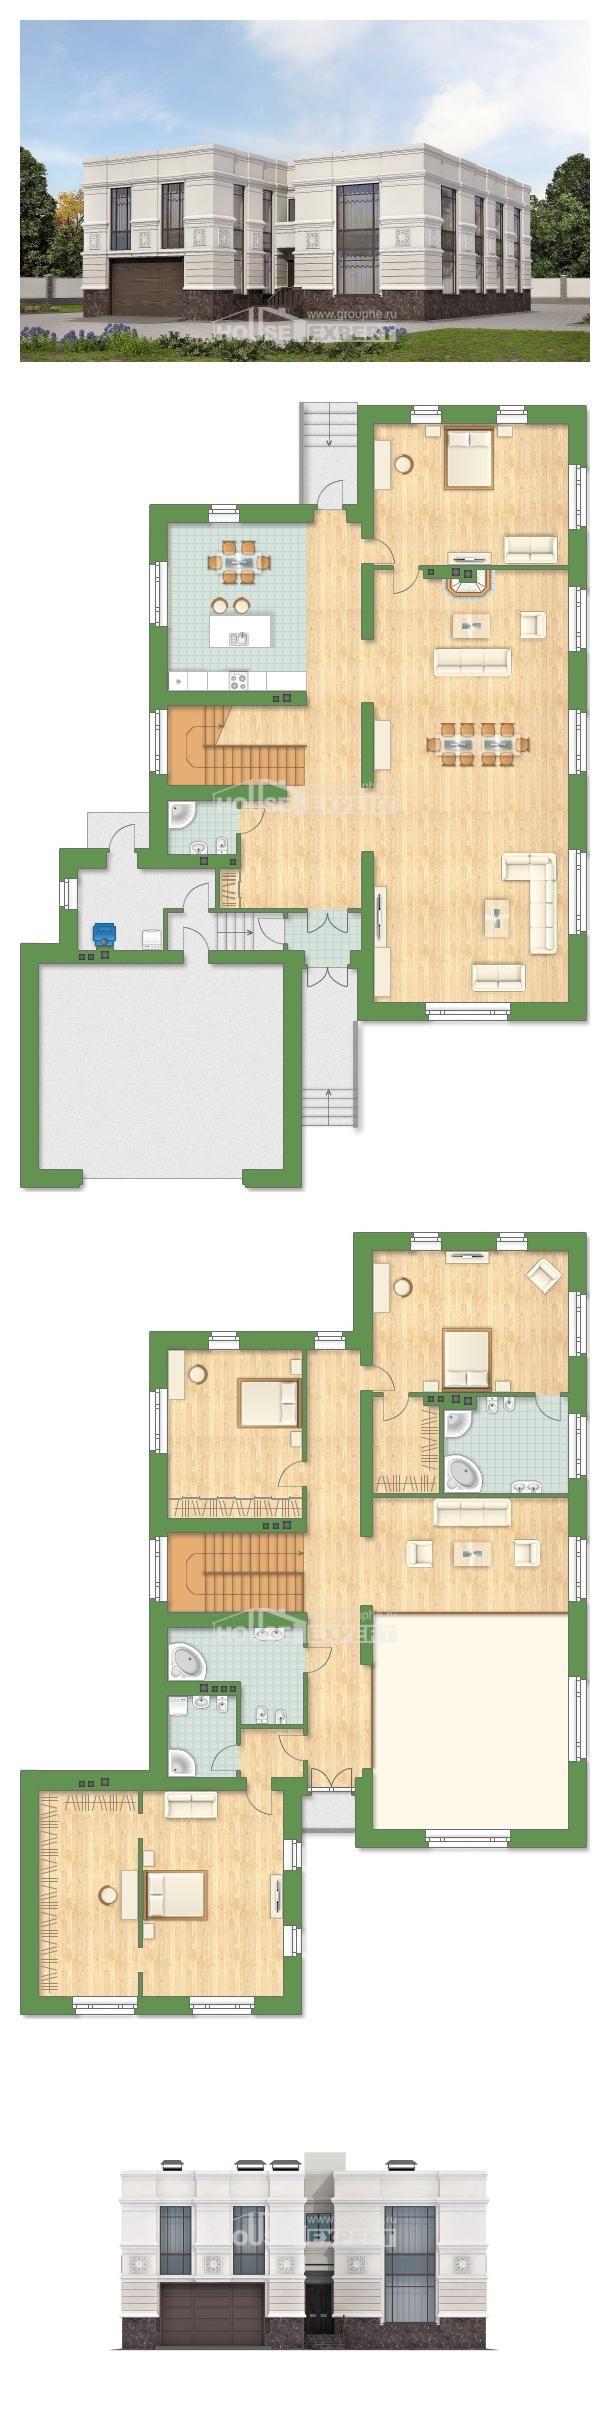 400 005 house expert h user grundrisse pinterest grundrisse h uschen. Black Bedroom Furniture Sets. Home Design Ideas